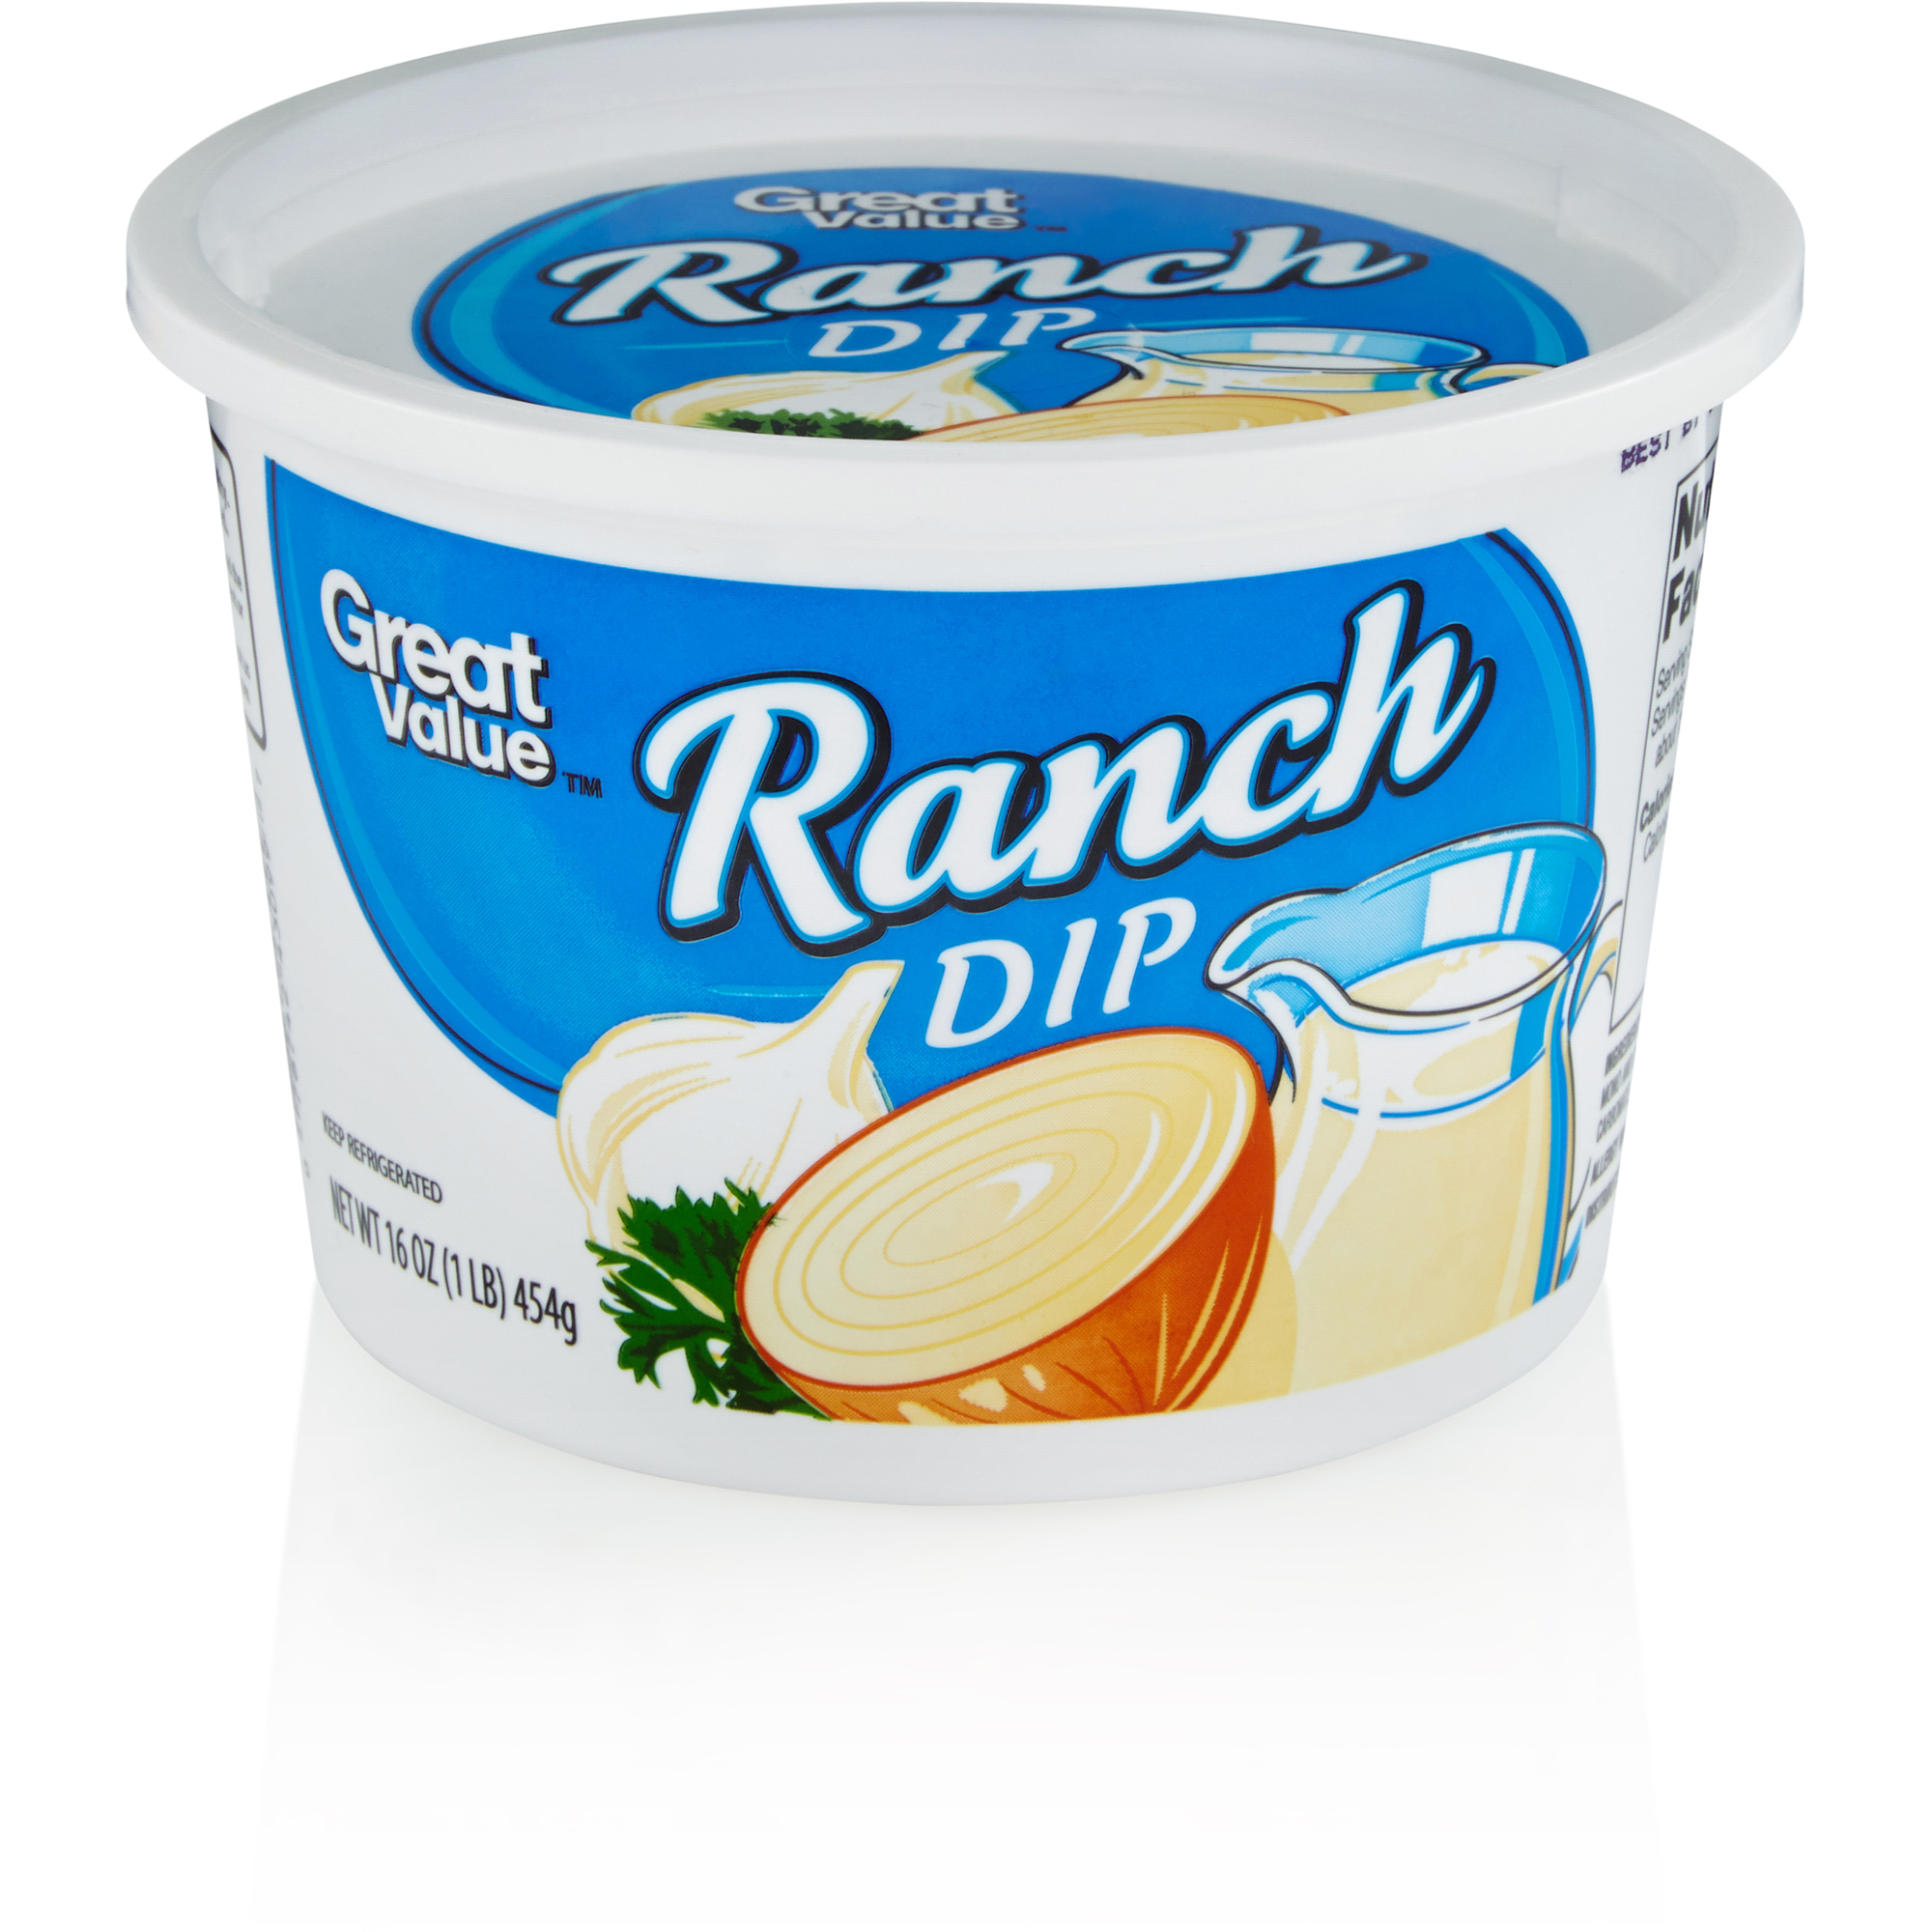 Great Value Ranch Dip, 16 oz